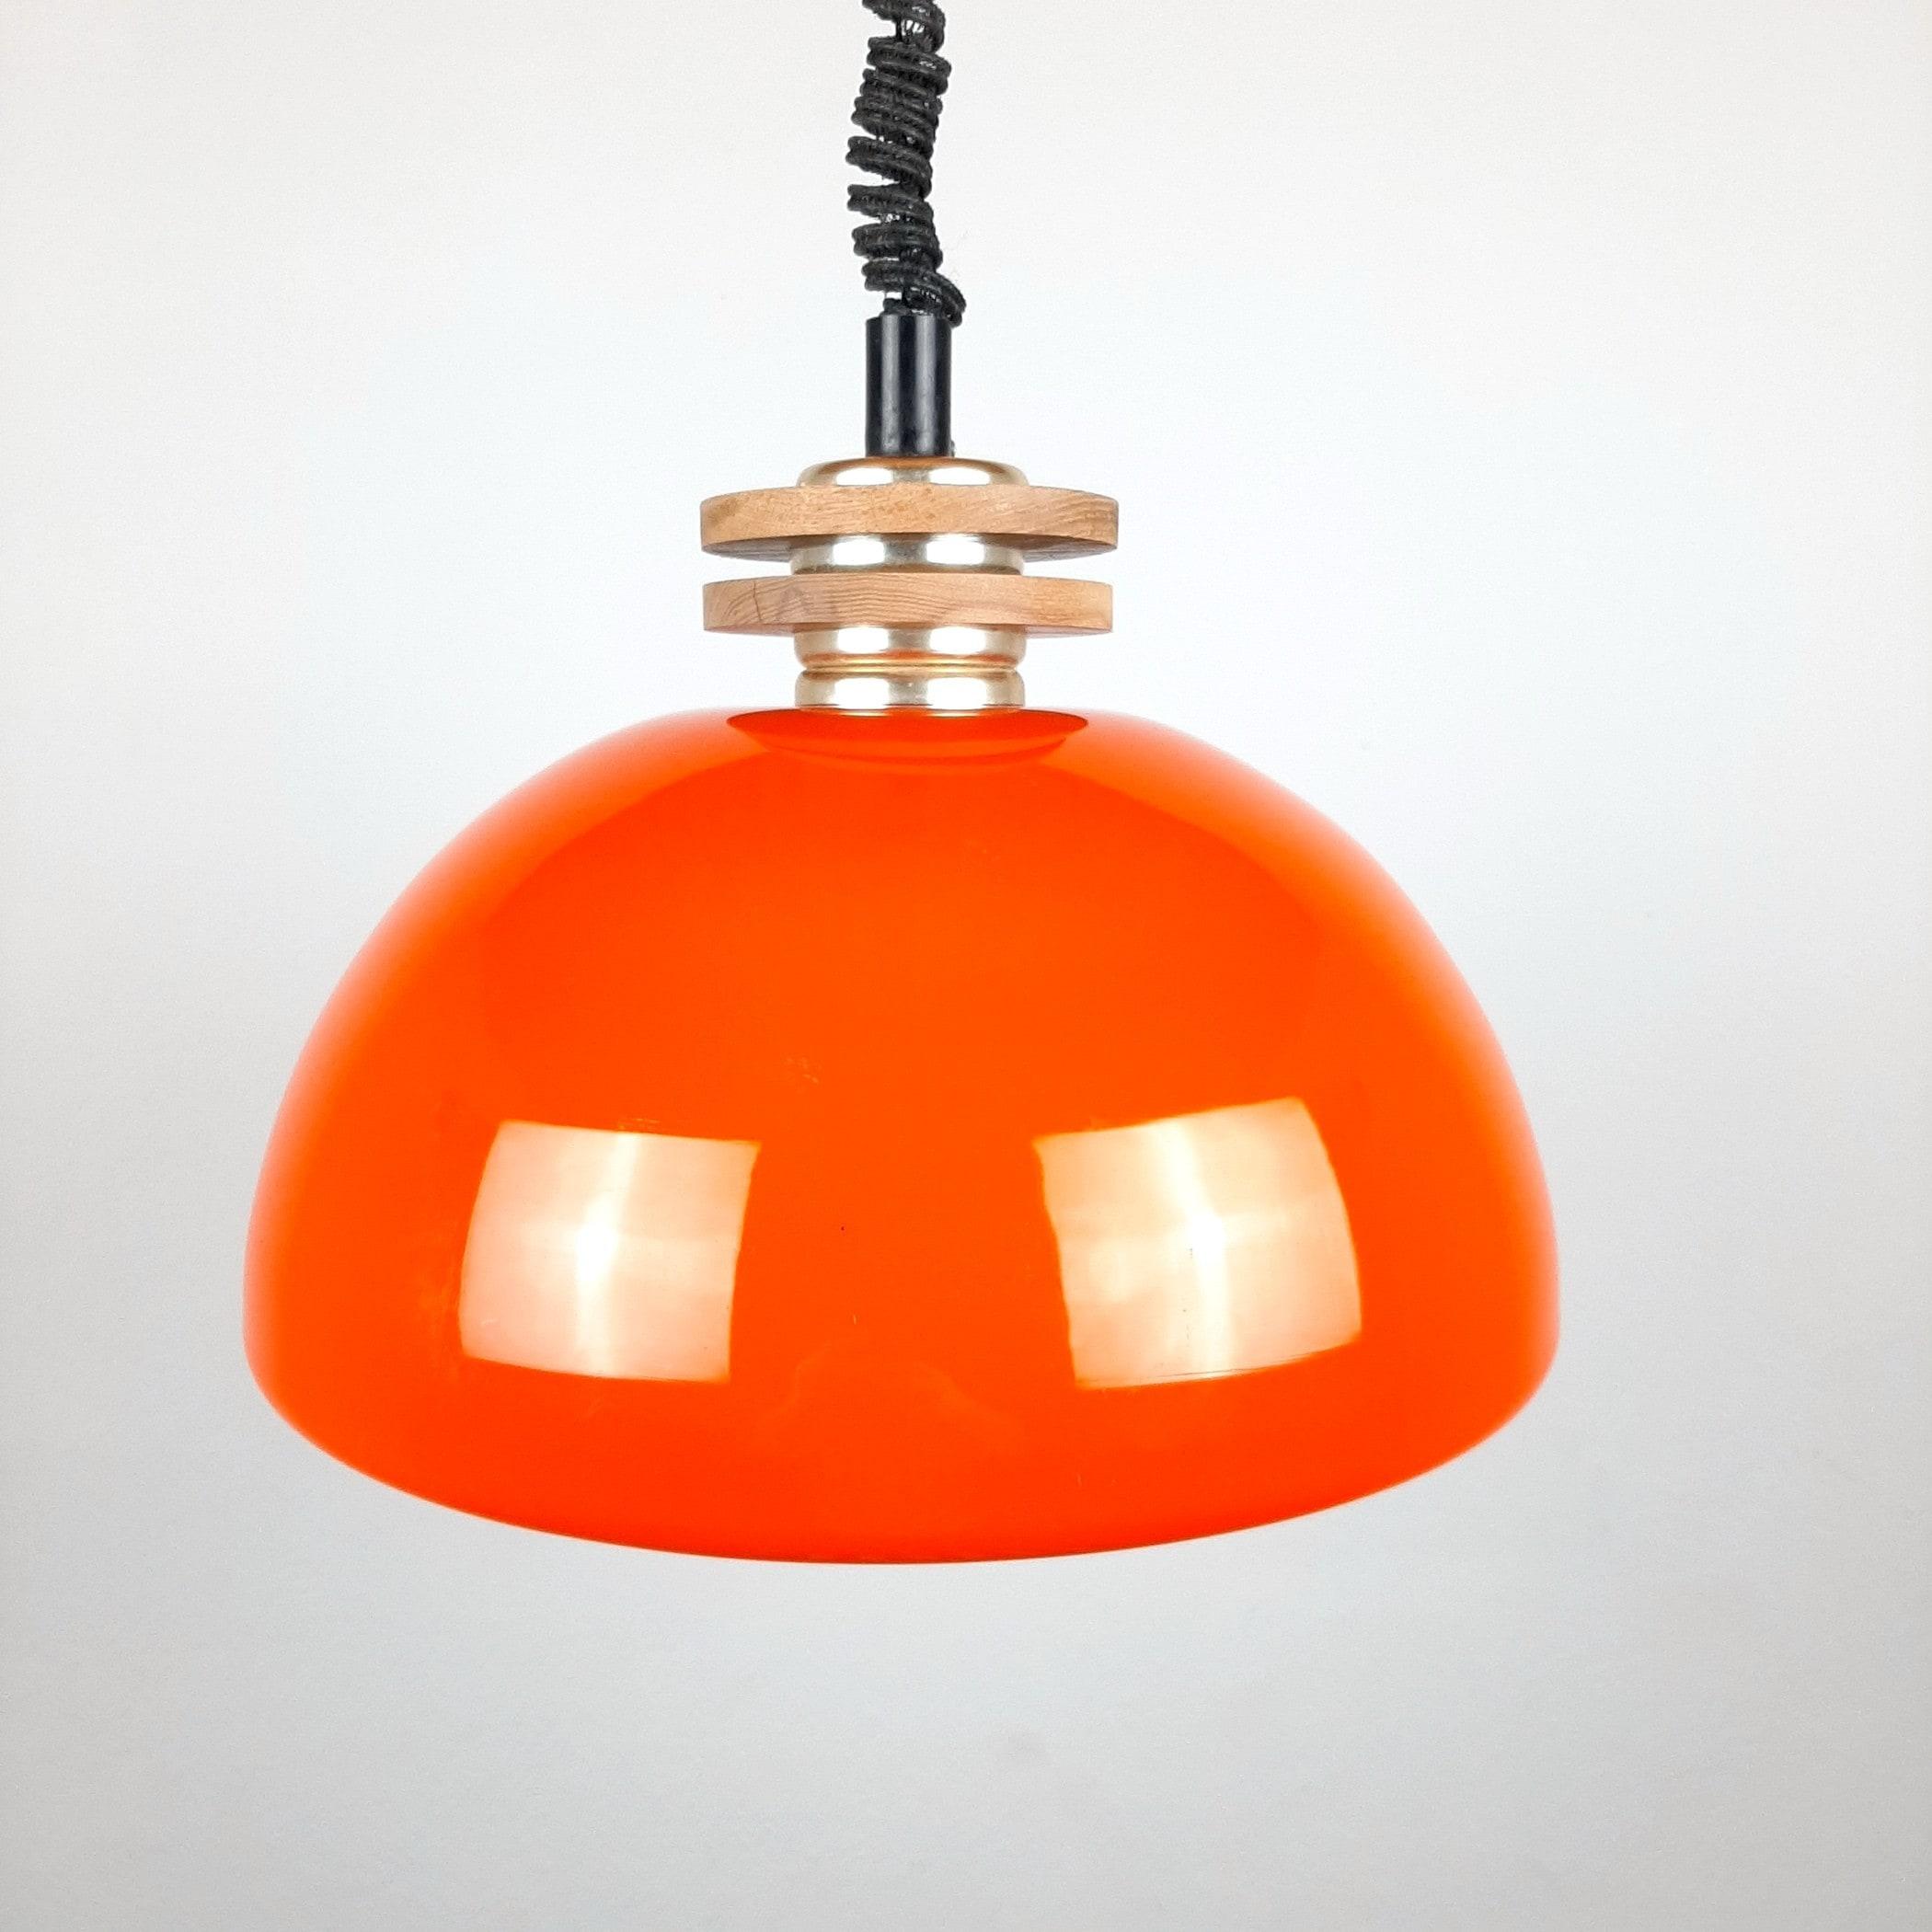 Mid-century orange glass pendant lamp Yugoslavia 1970s space age retro home decor